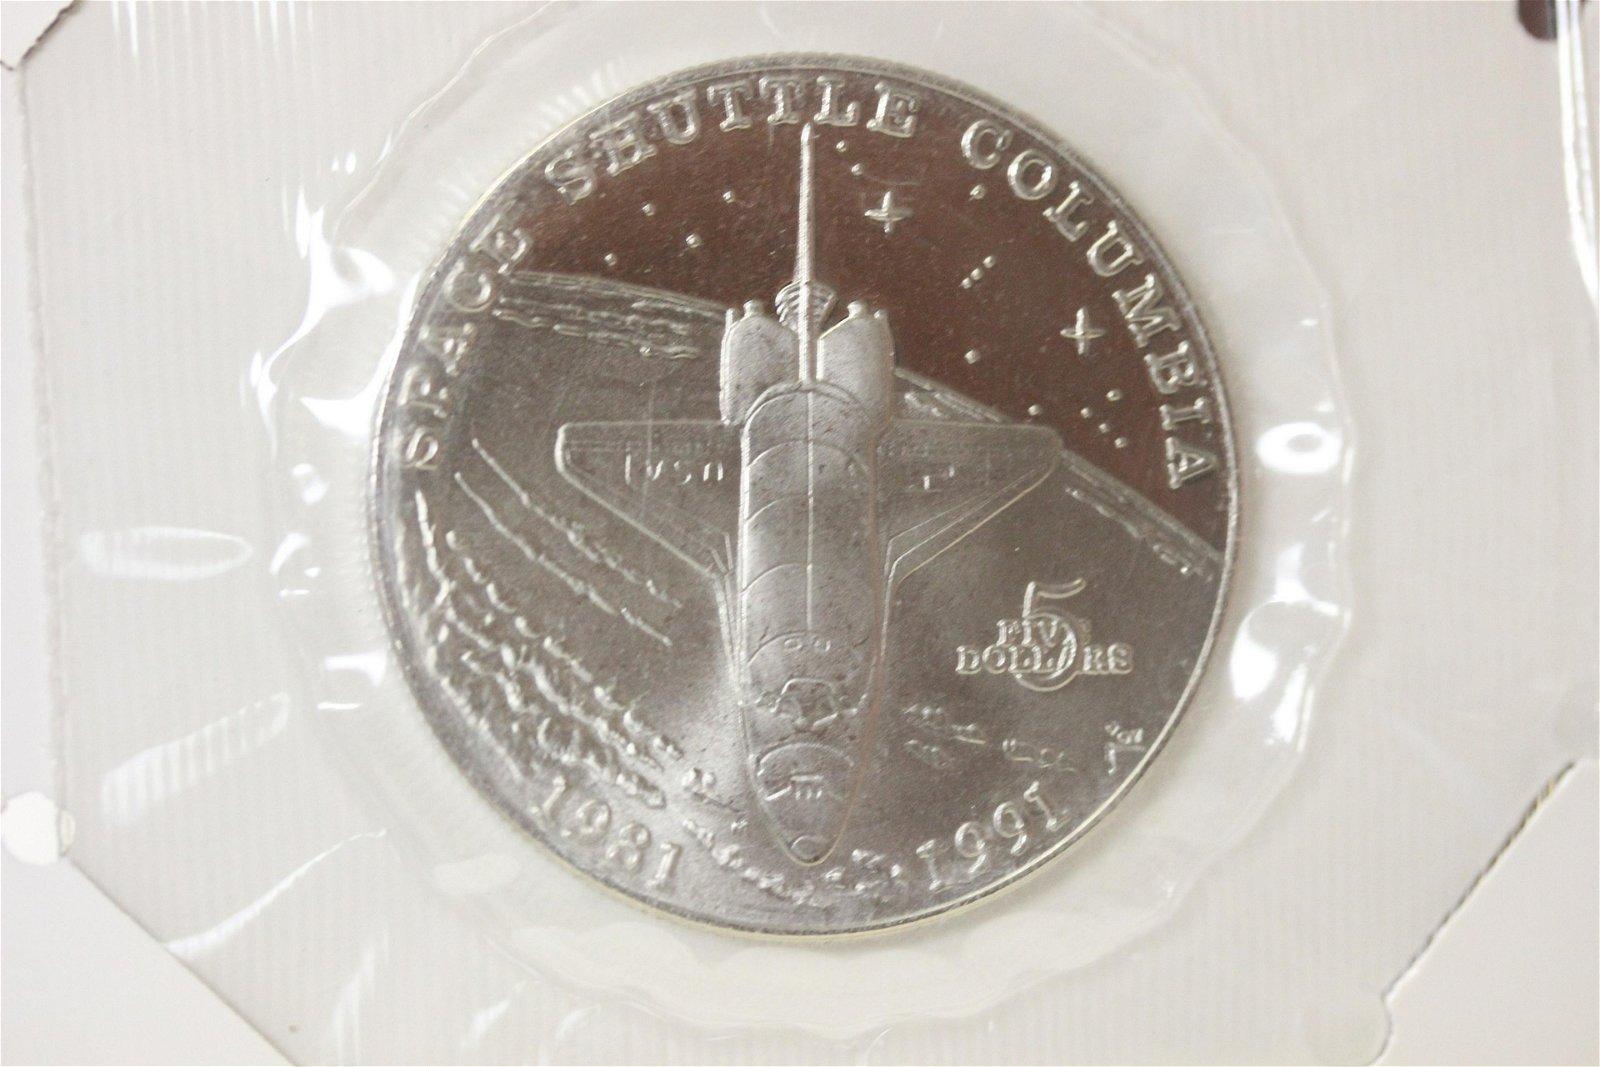 Marshall Island $5.00 Commemorative Coin